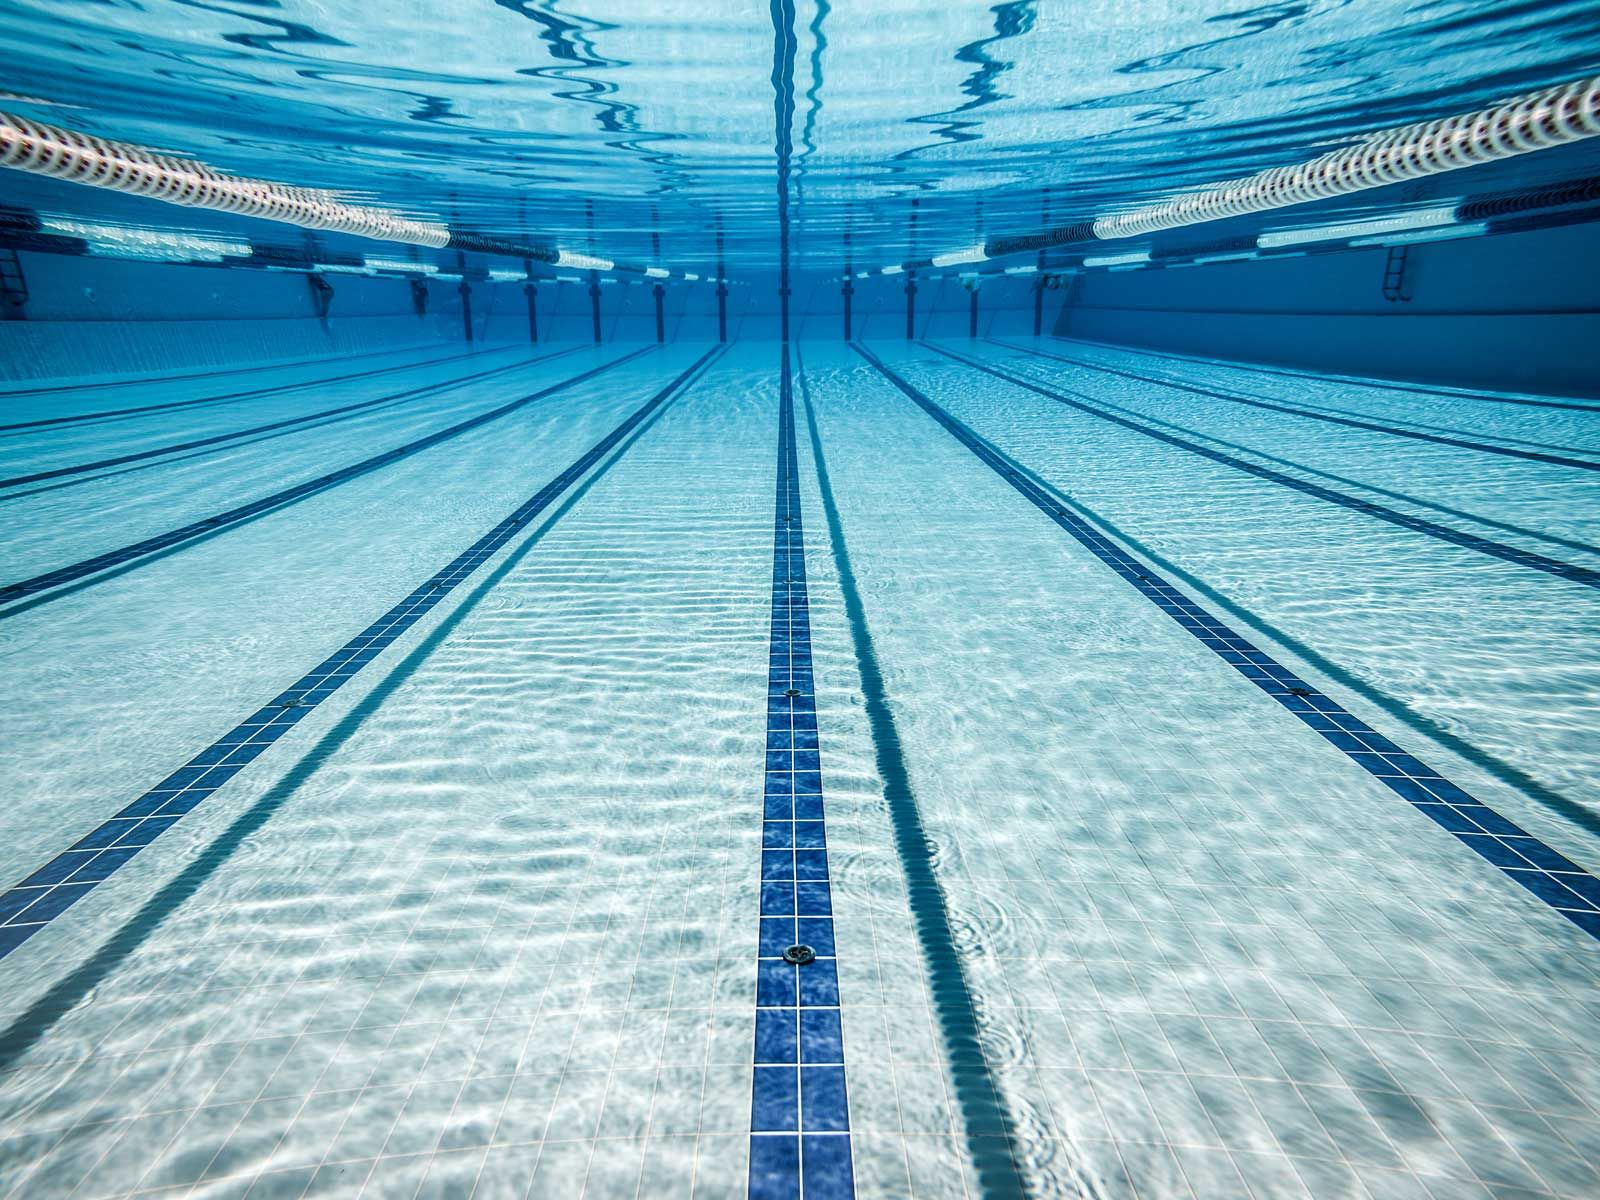 Vert aquaval piscine nogent le rotrou for Piscine nogent